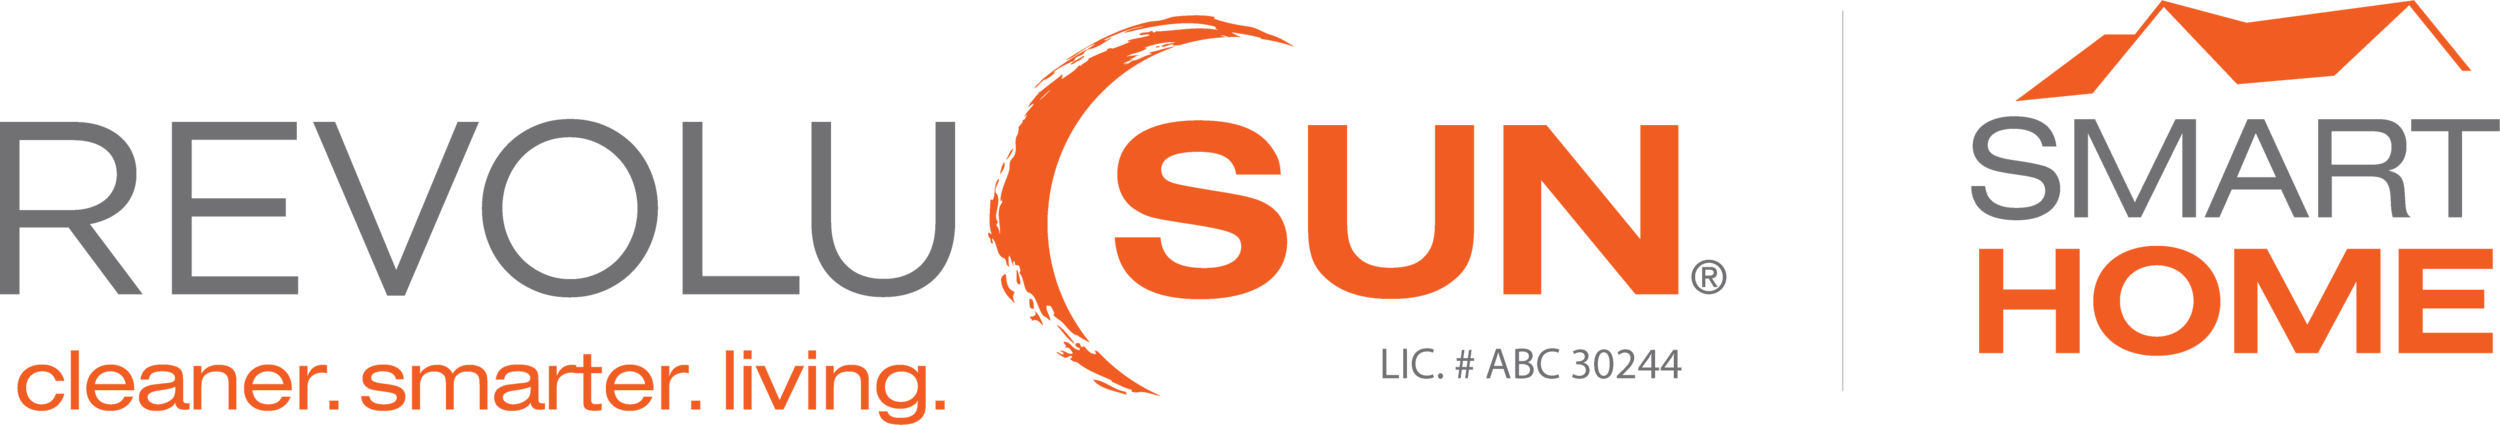 RSH_logo-w-LIC_Update.png